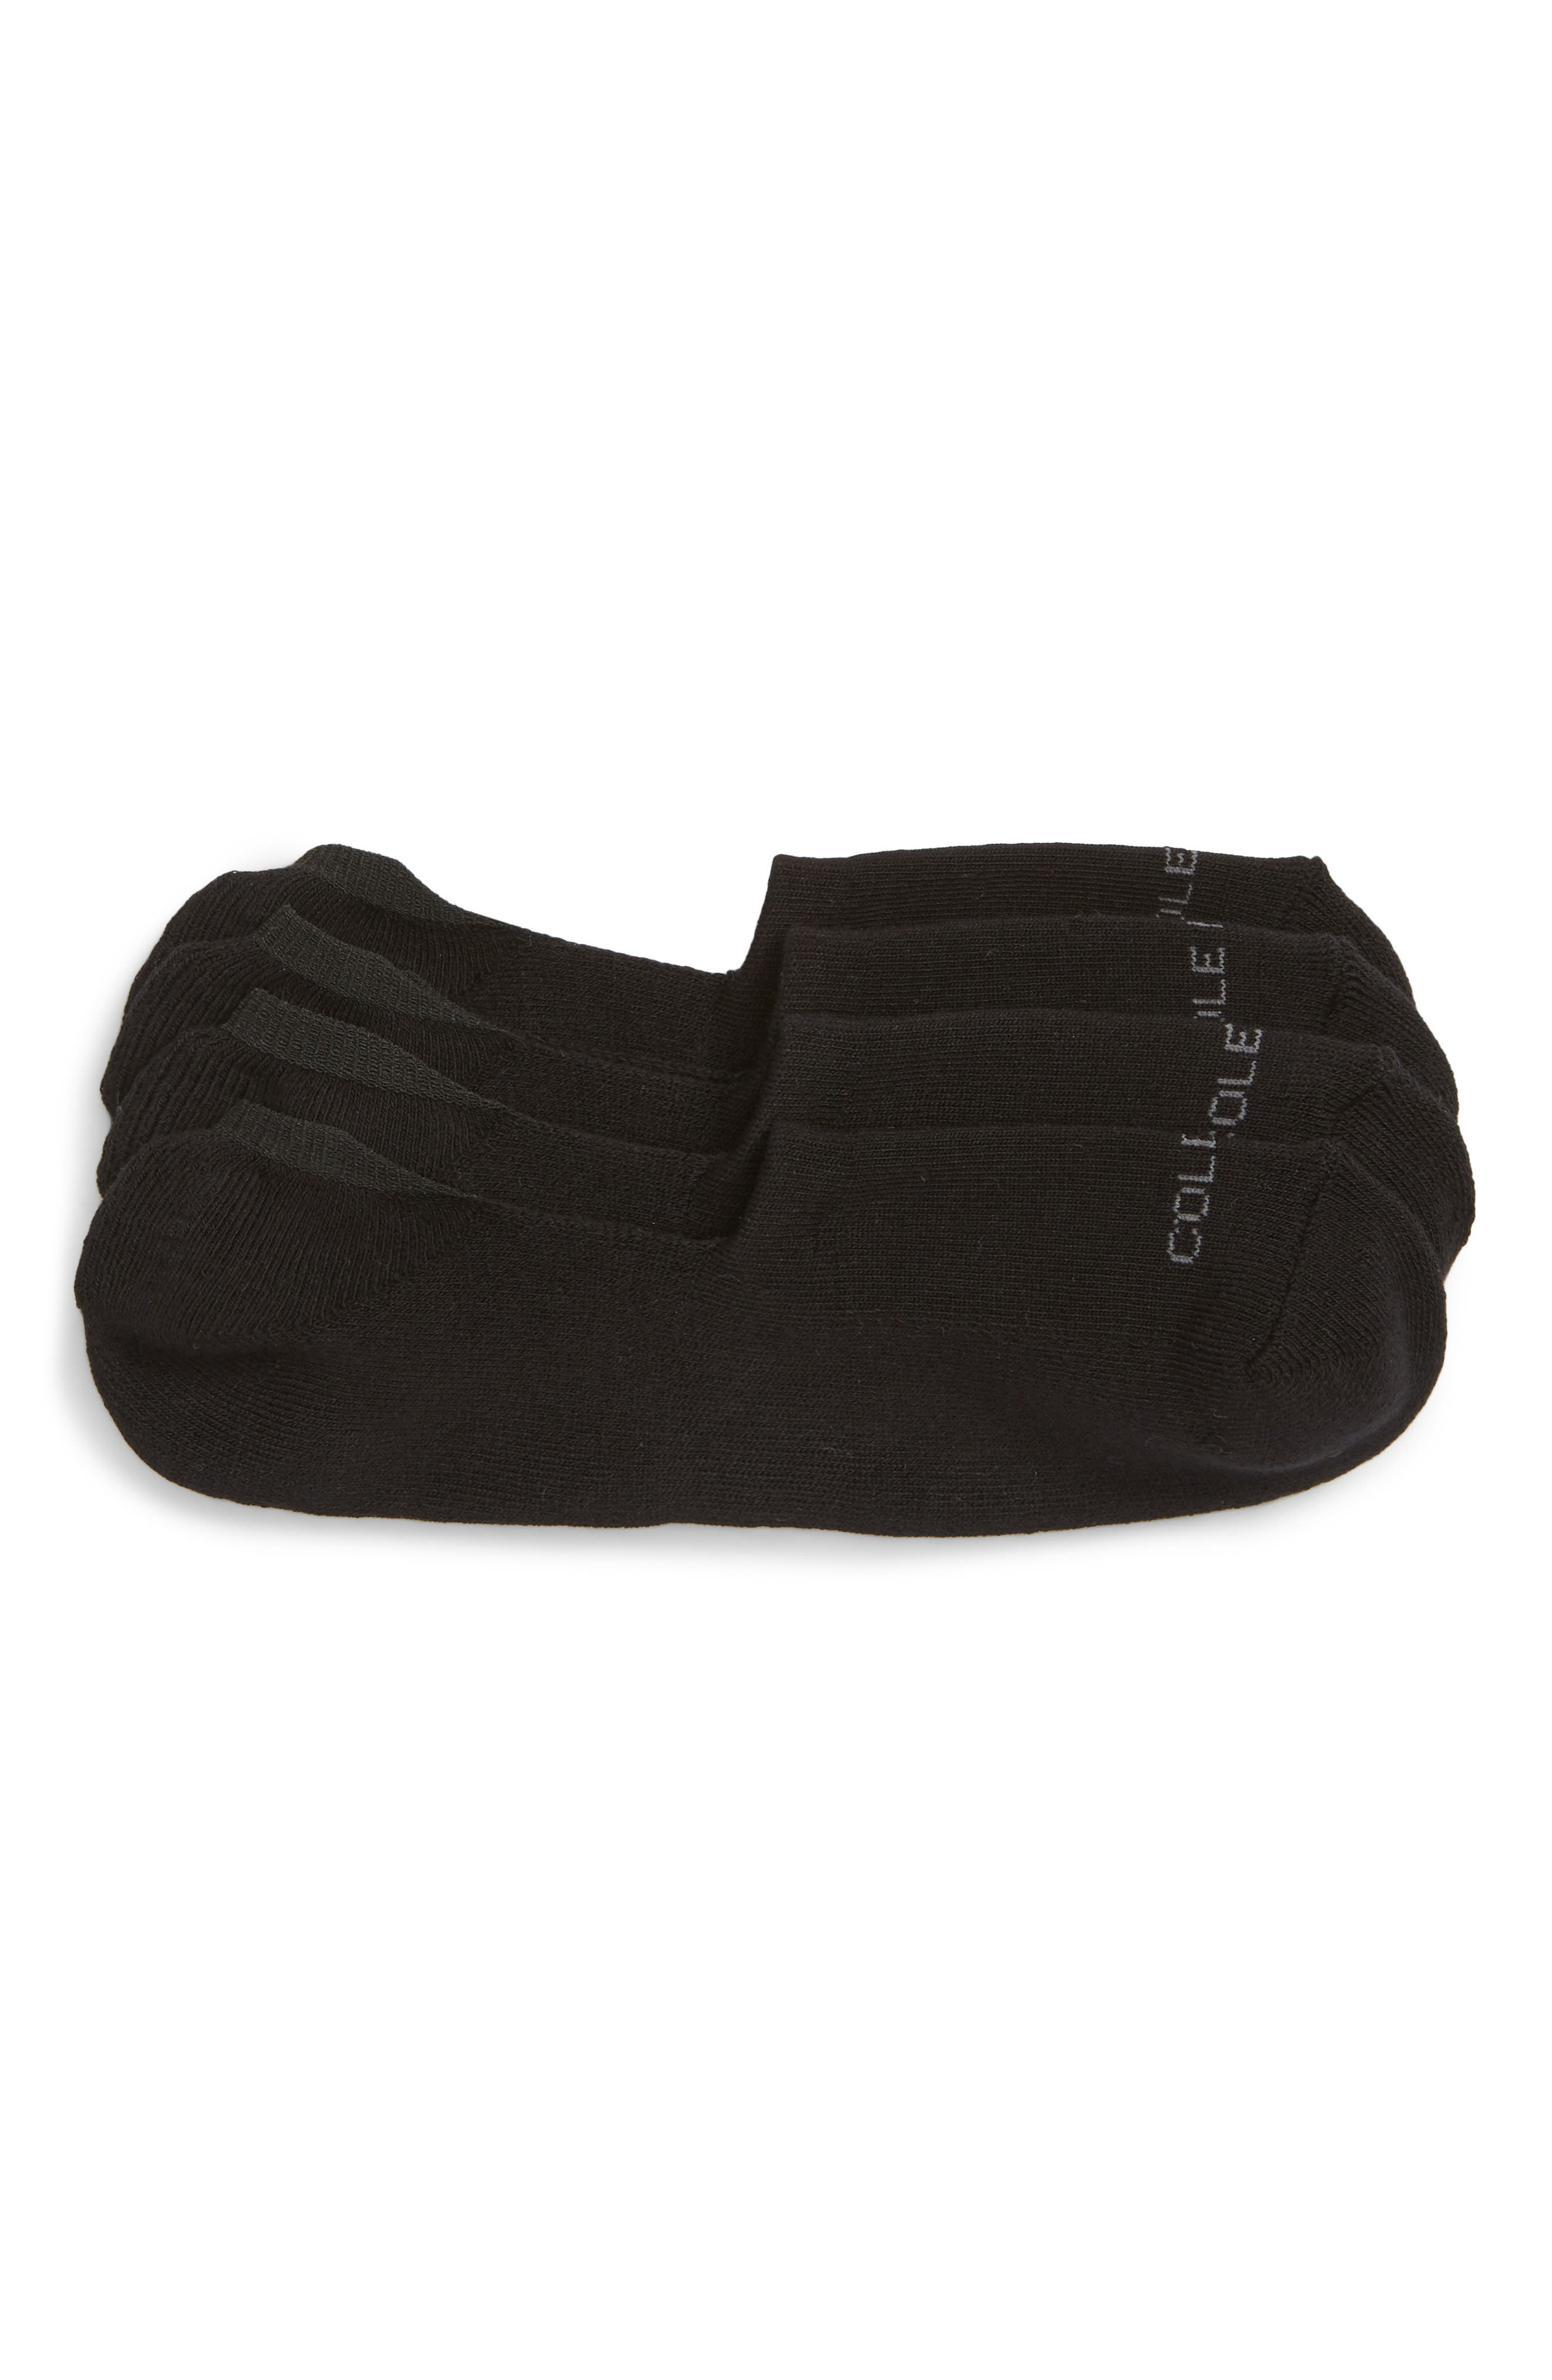 2-Pack Casual Cushion No-Show Socks,                         Main,                         color, BLACK